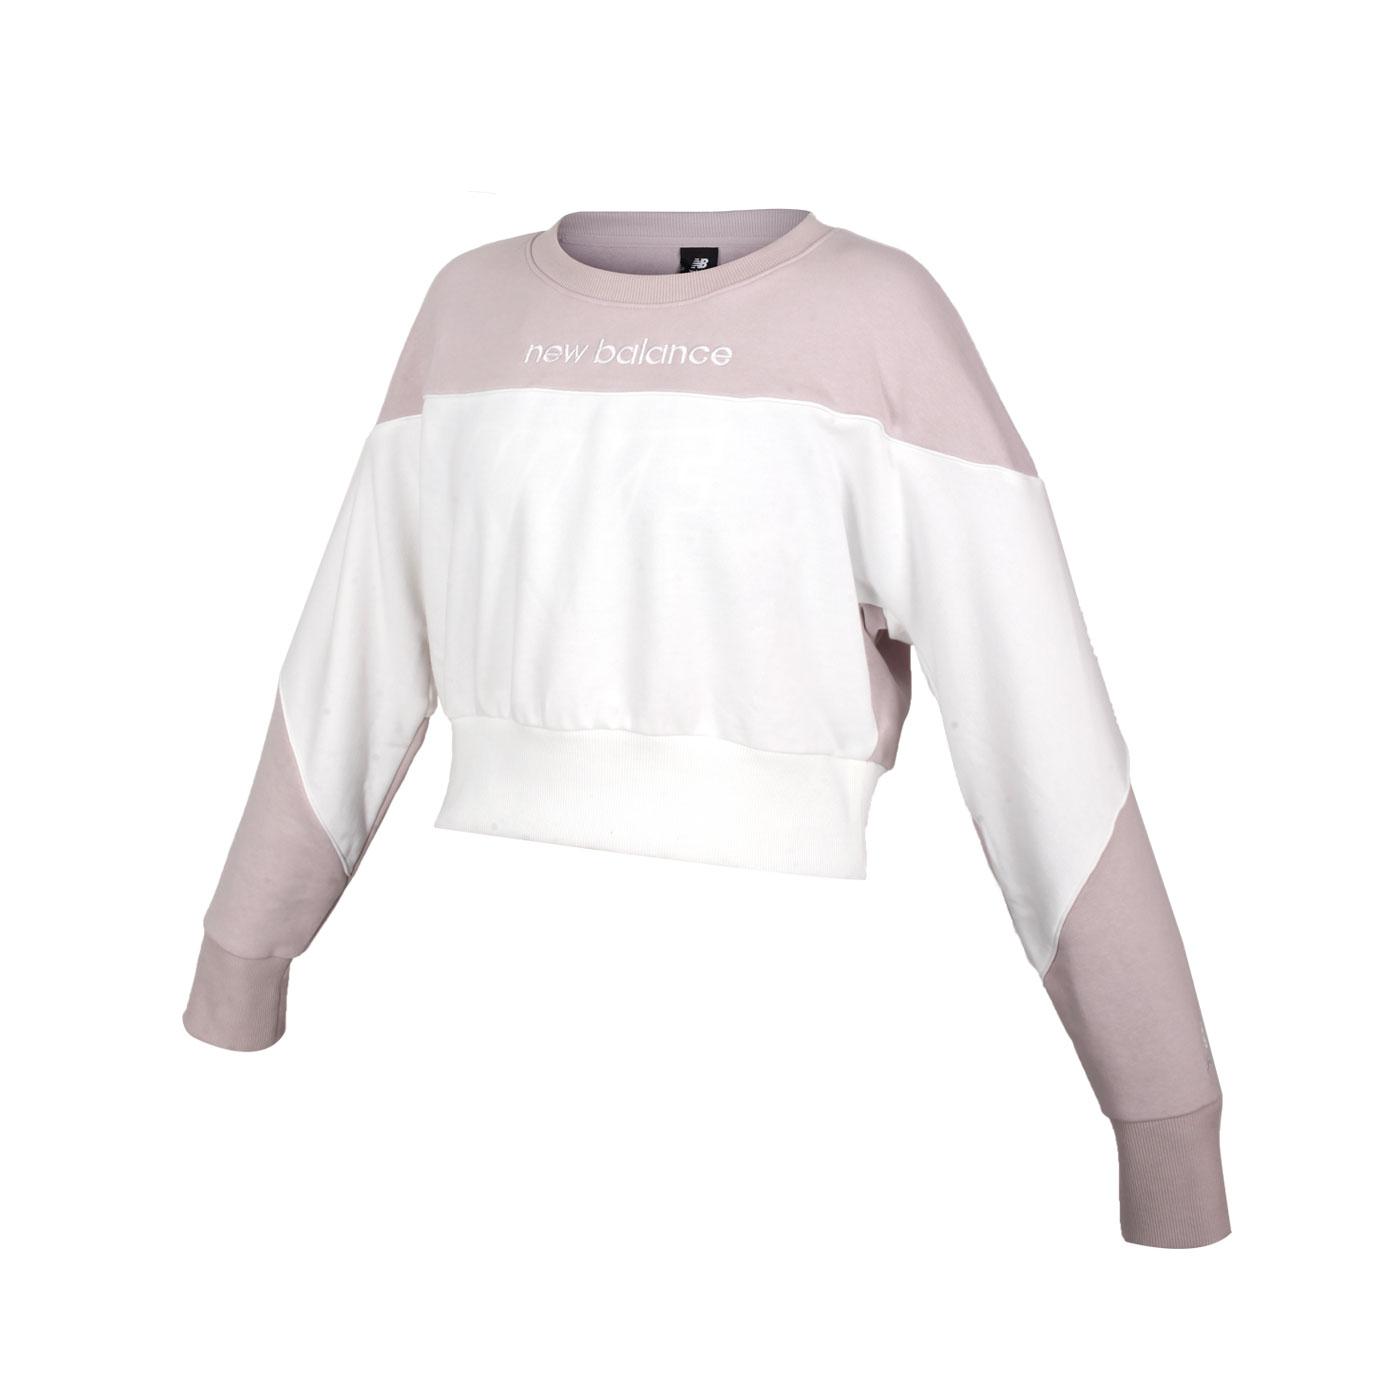 NEW BALANCE 女款短版圓領長袖T恤 AWT11503WM - 藕粉白